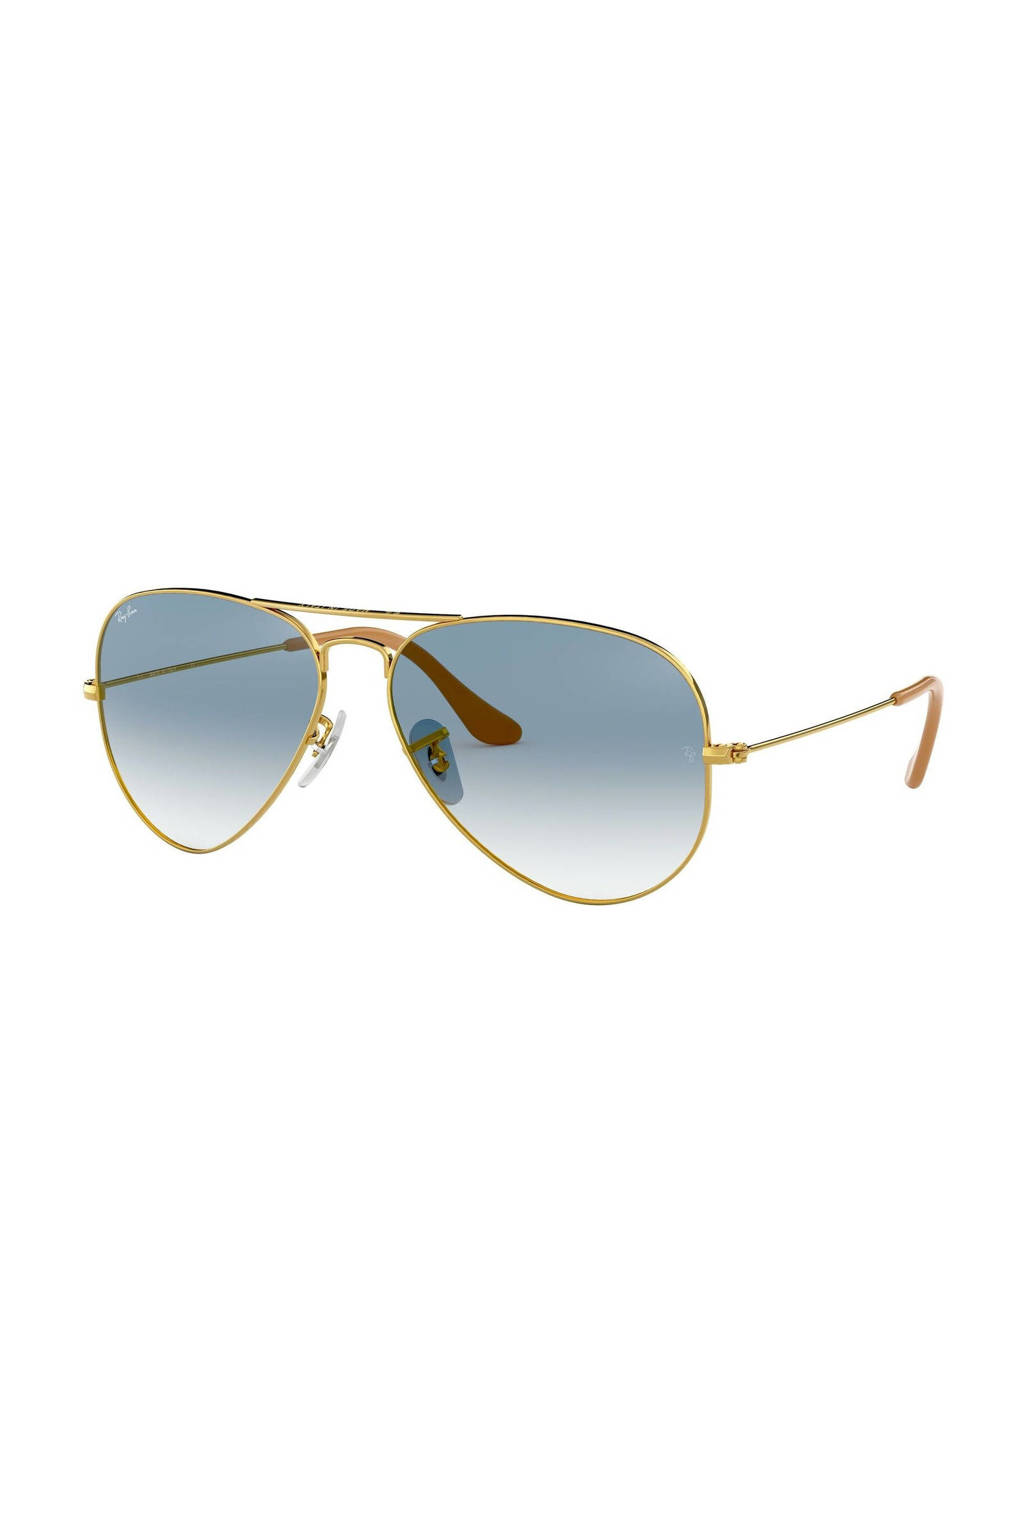 Ray-Ban zonnebril 0RB3025, Lichtblauw